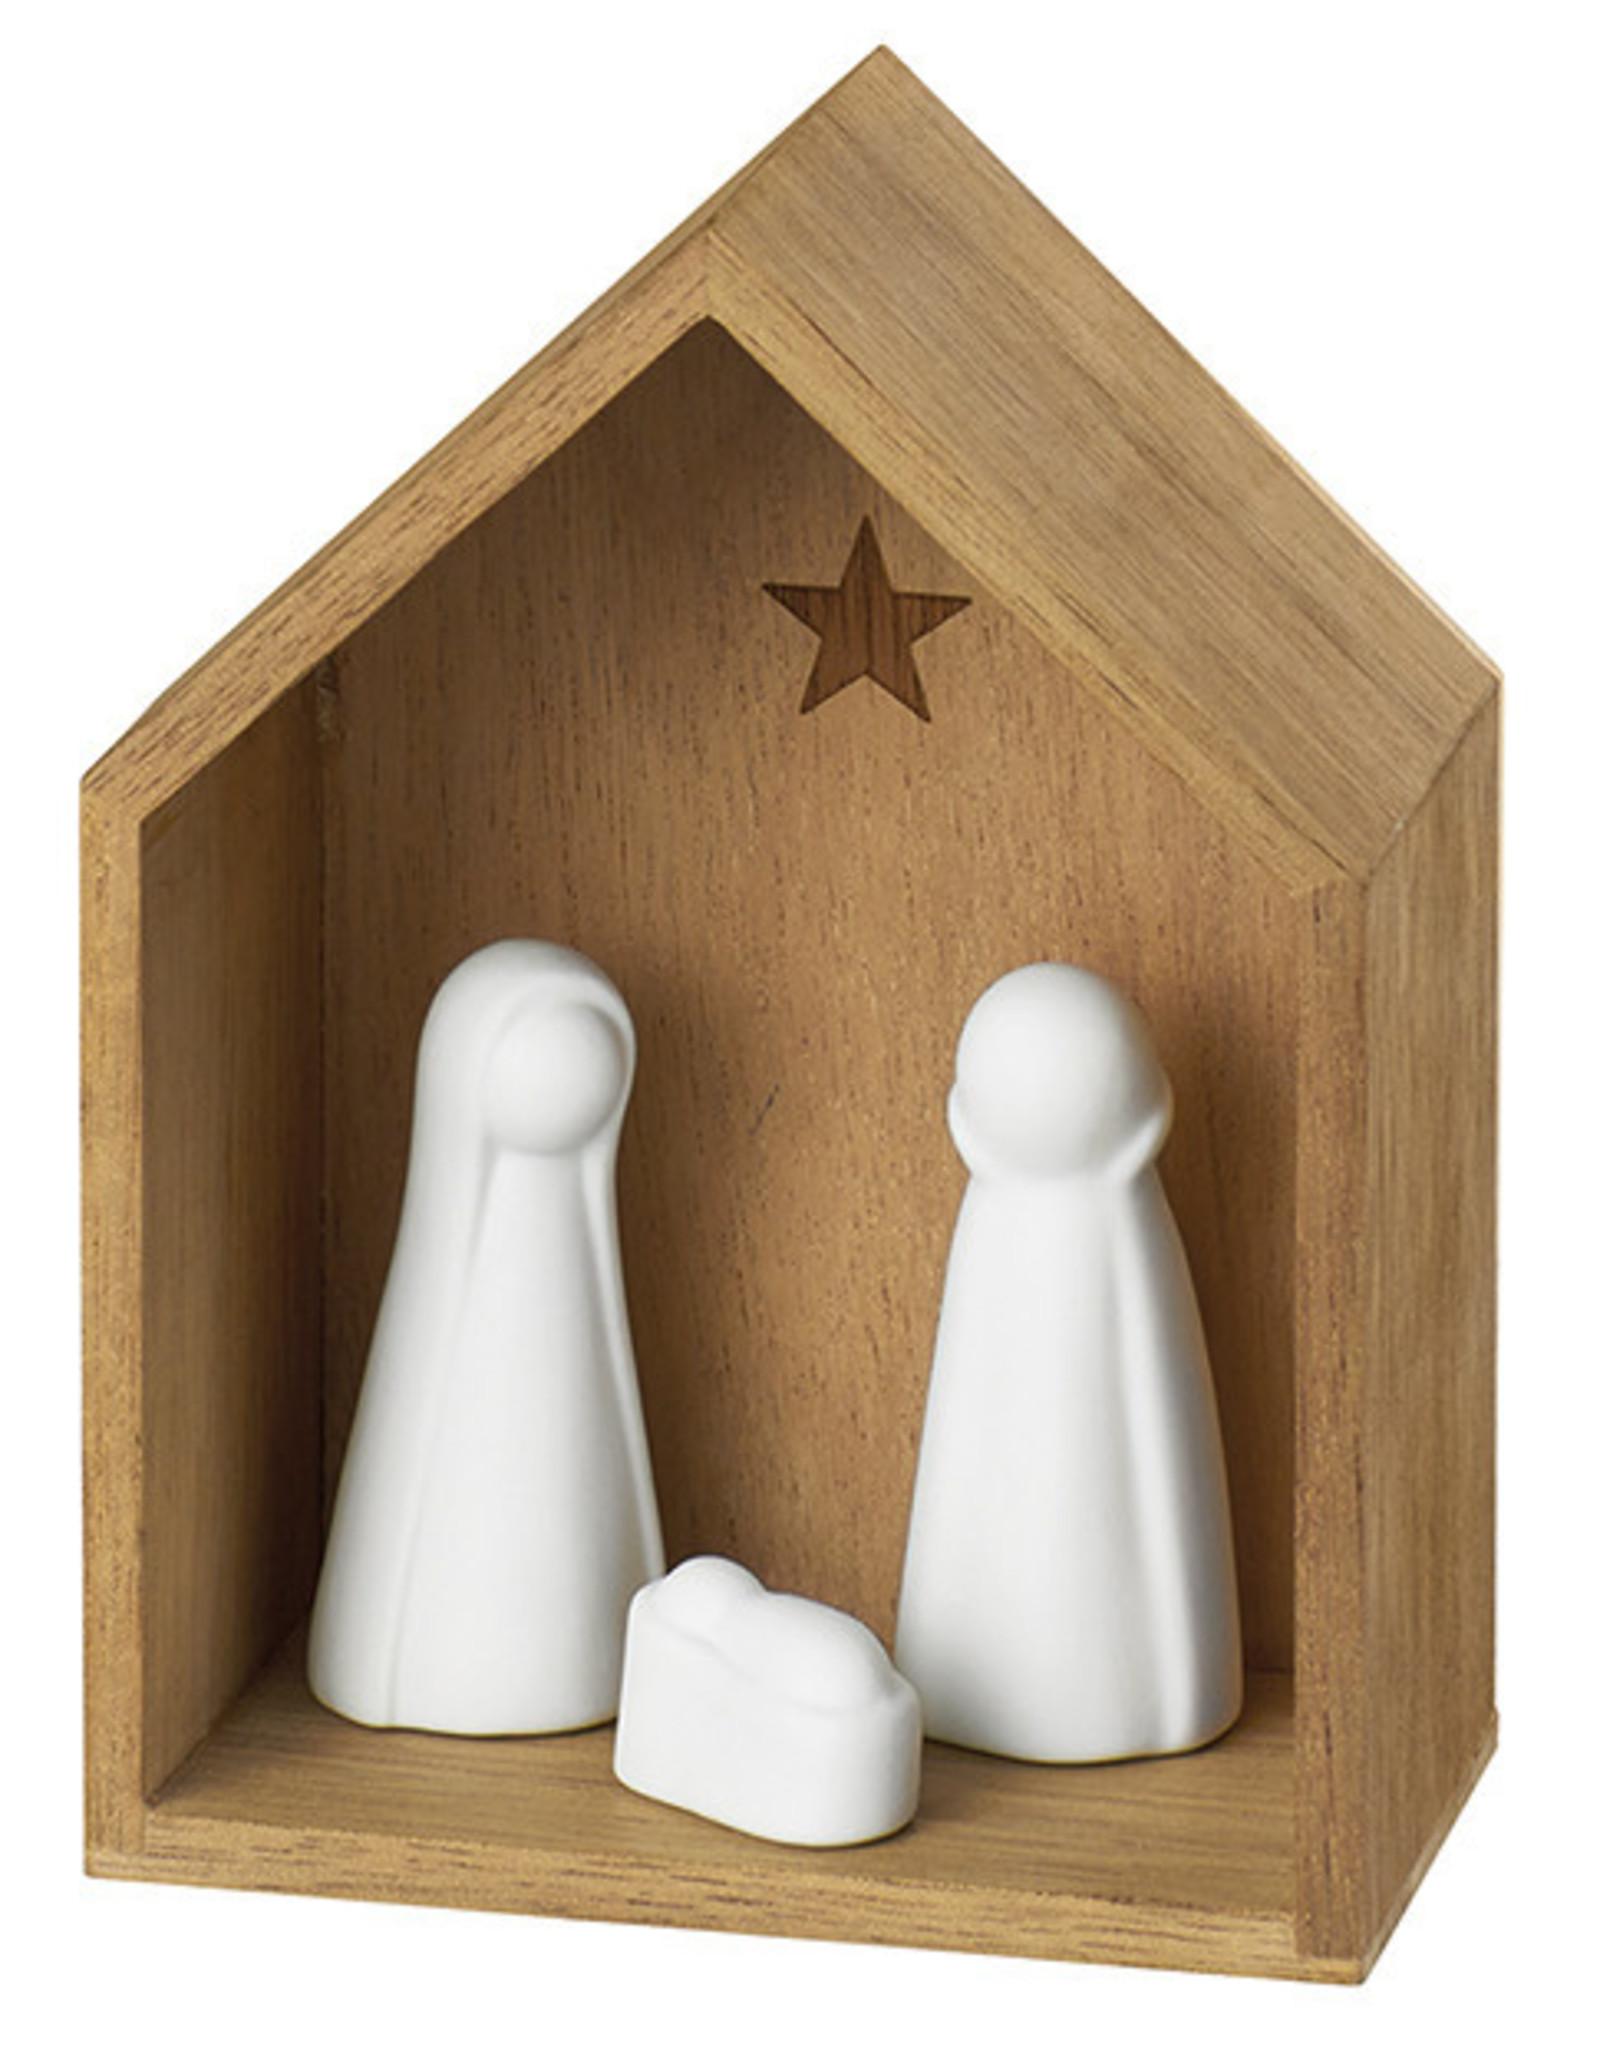 Raeder Kerststal hout met witte figuren Small